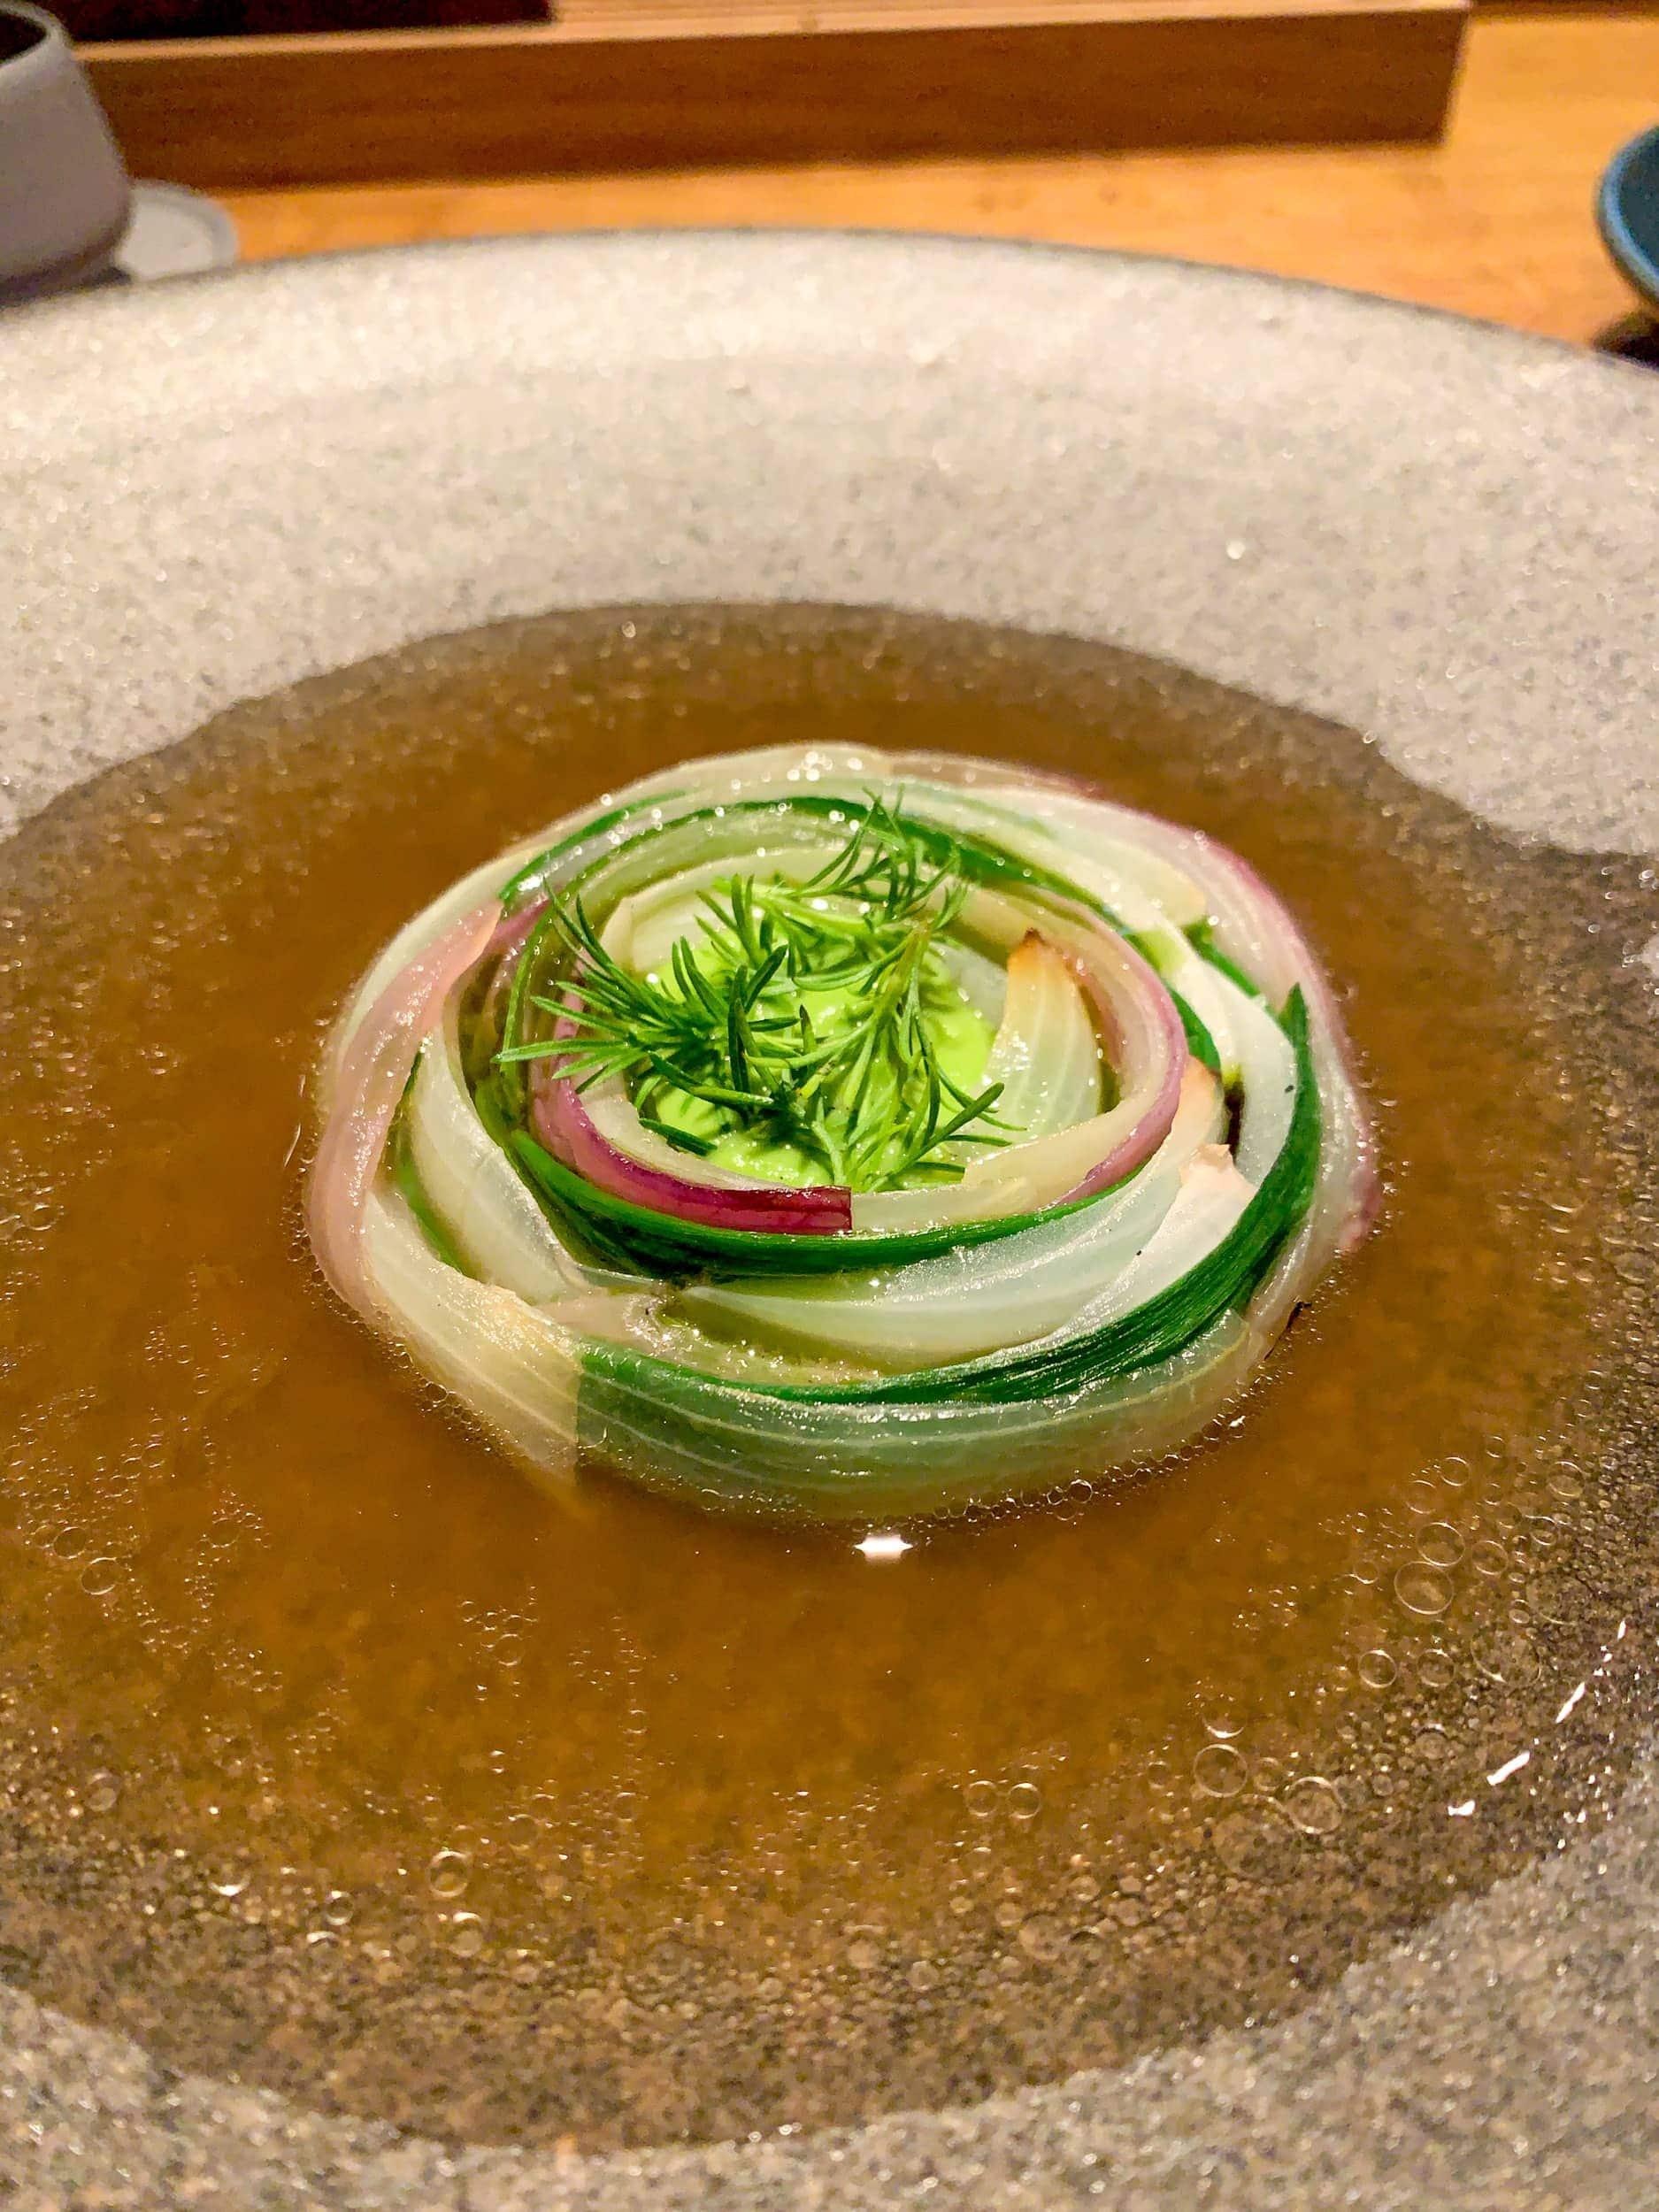 Onion in lamb broth